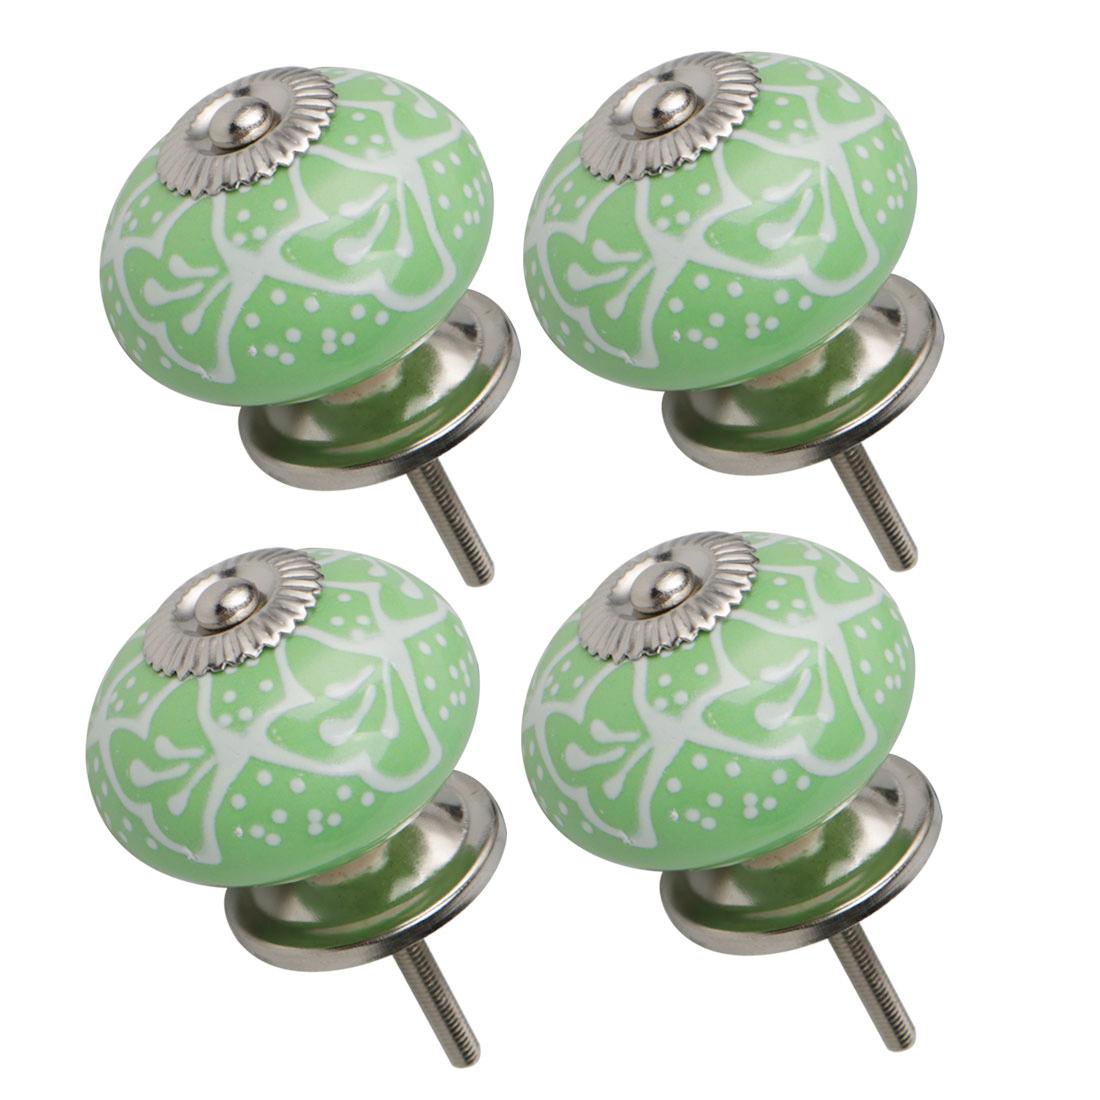 Ceramic Knob Drawers Round Pull Handle Cabinet Wardrobe Dresser Door 4pcs Green